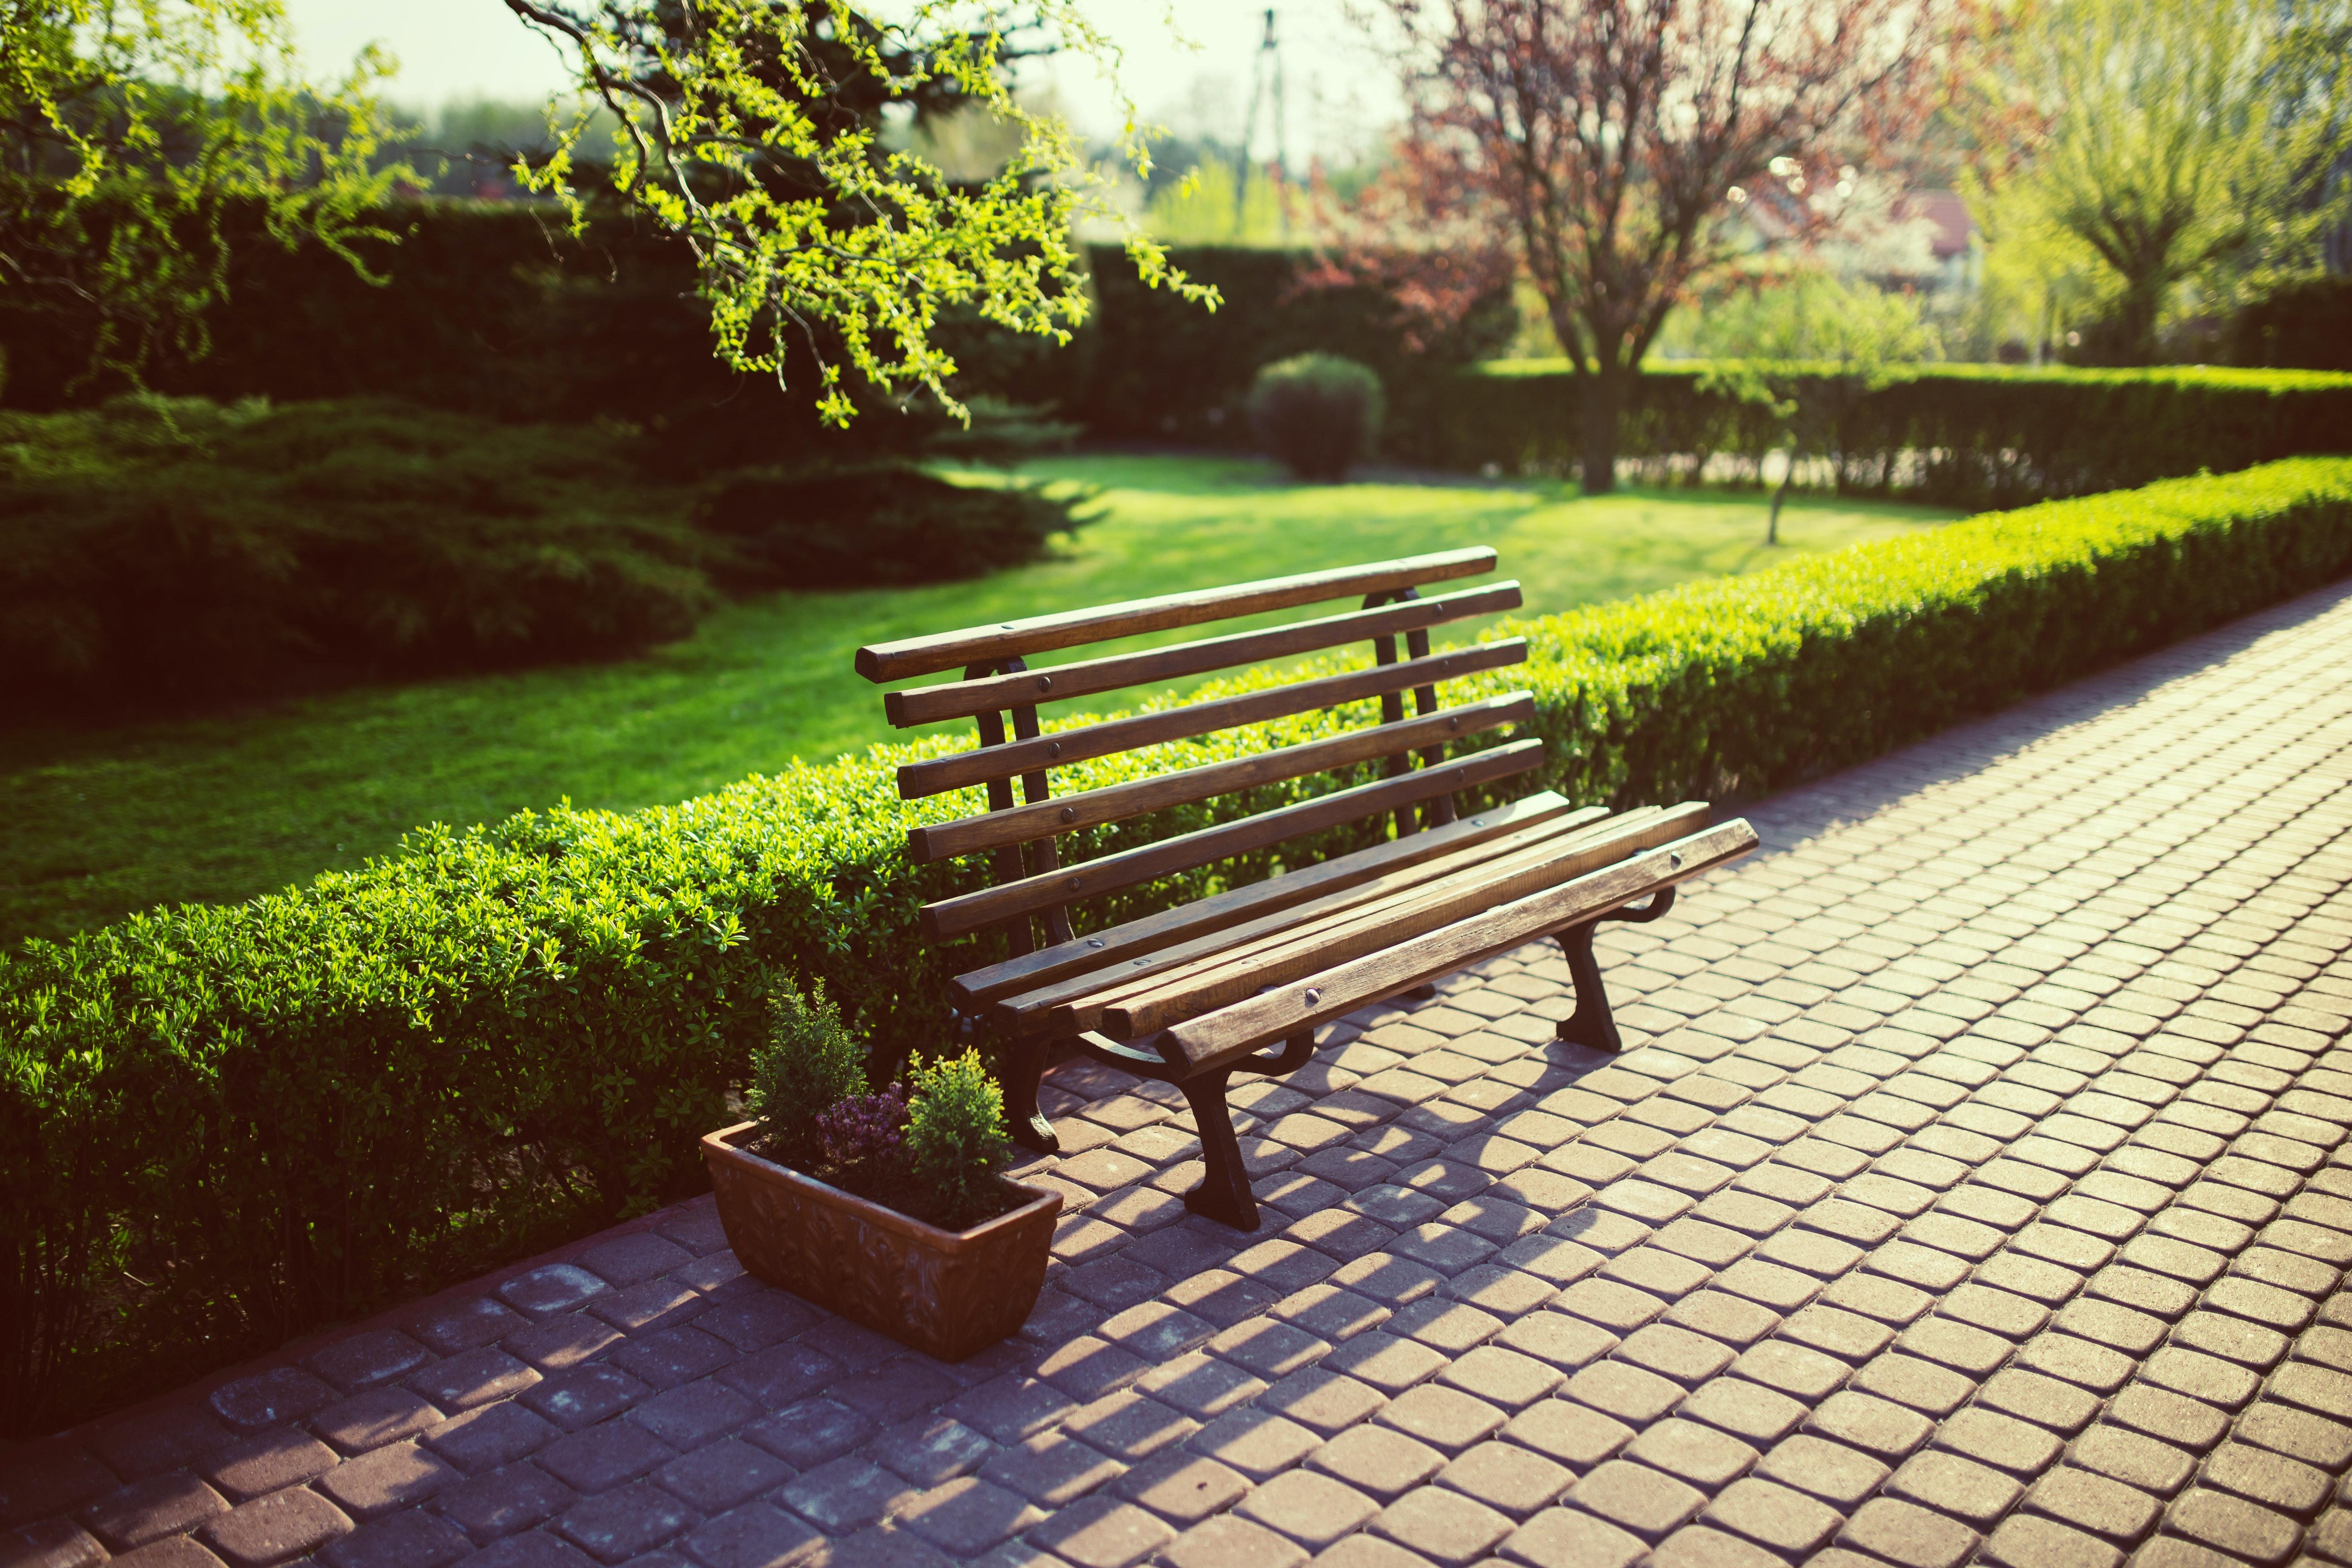 bench-in-the-garden-5760.jpg